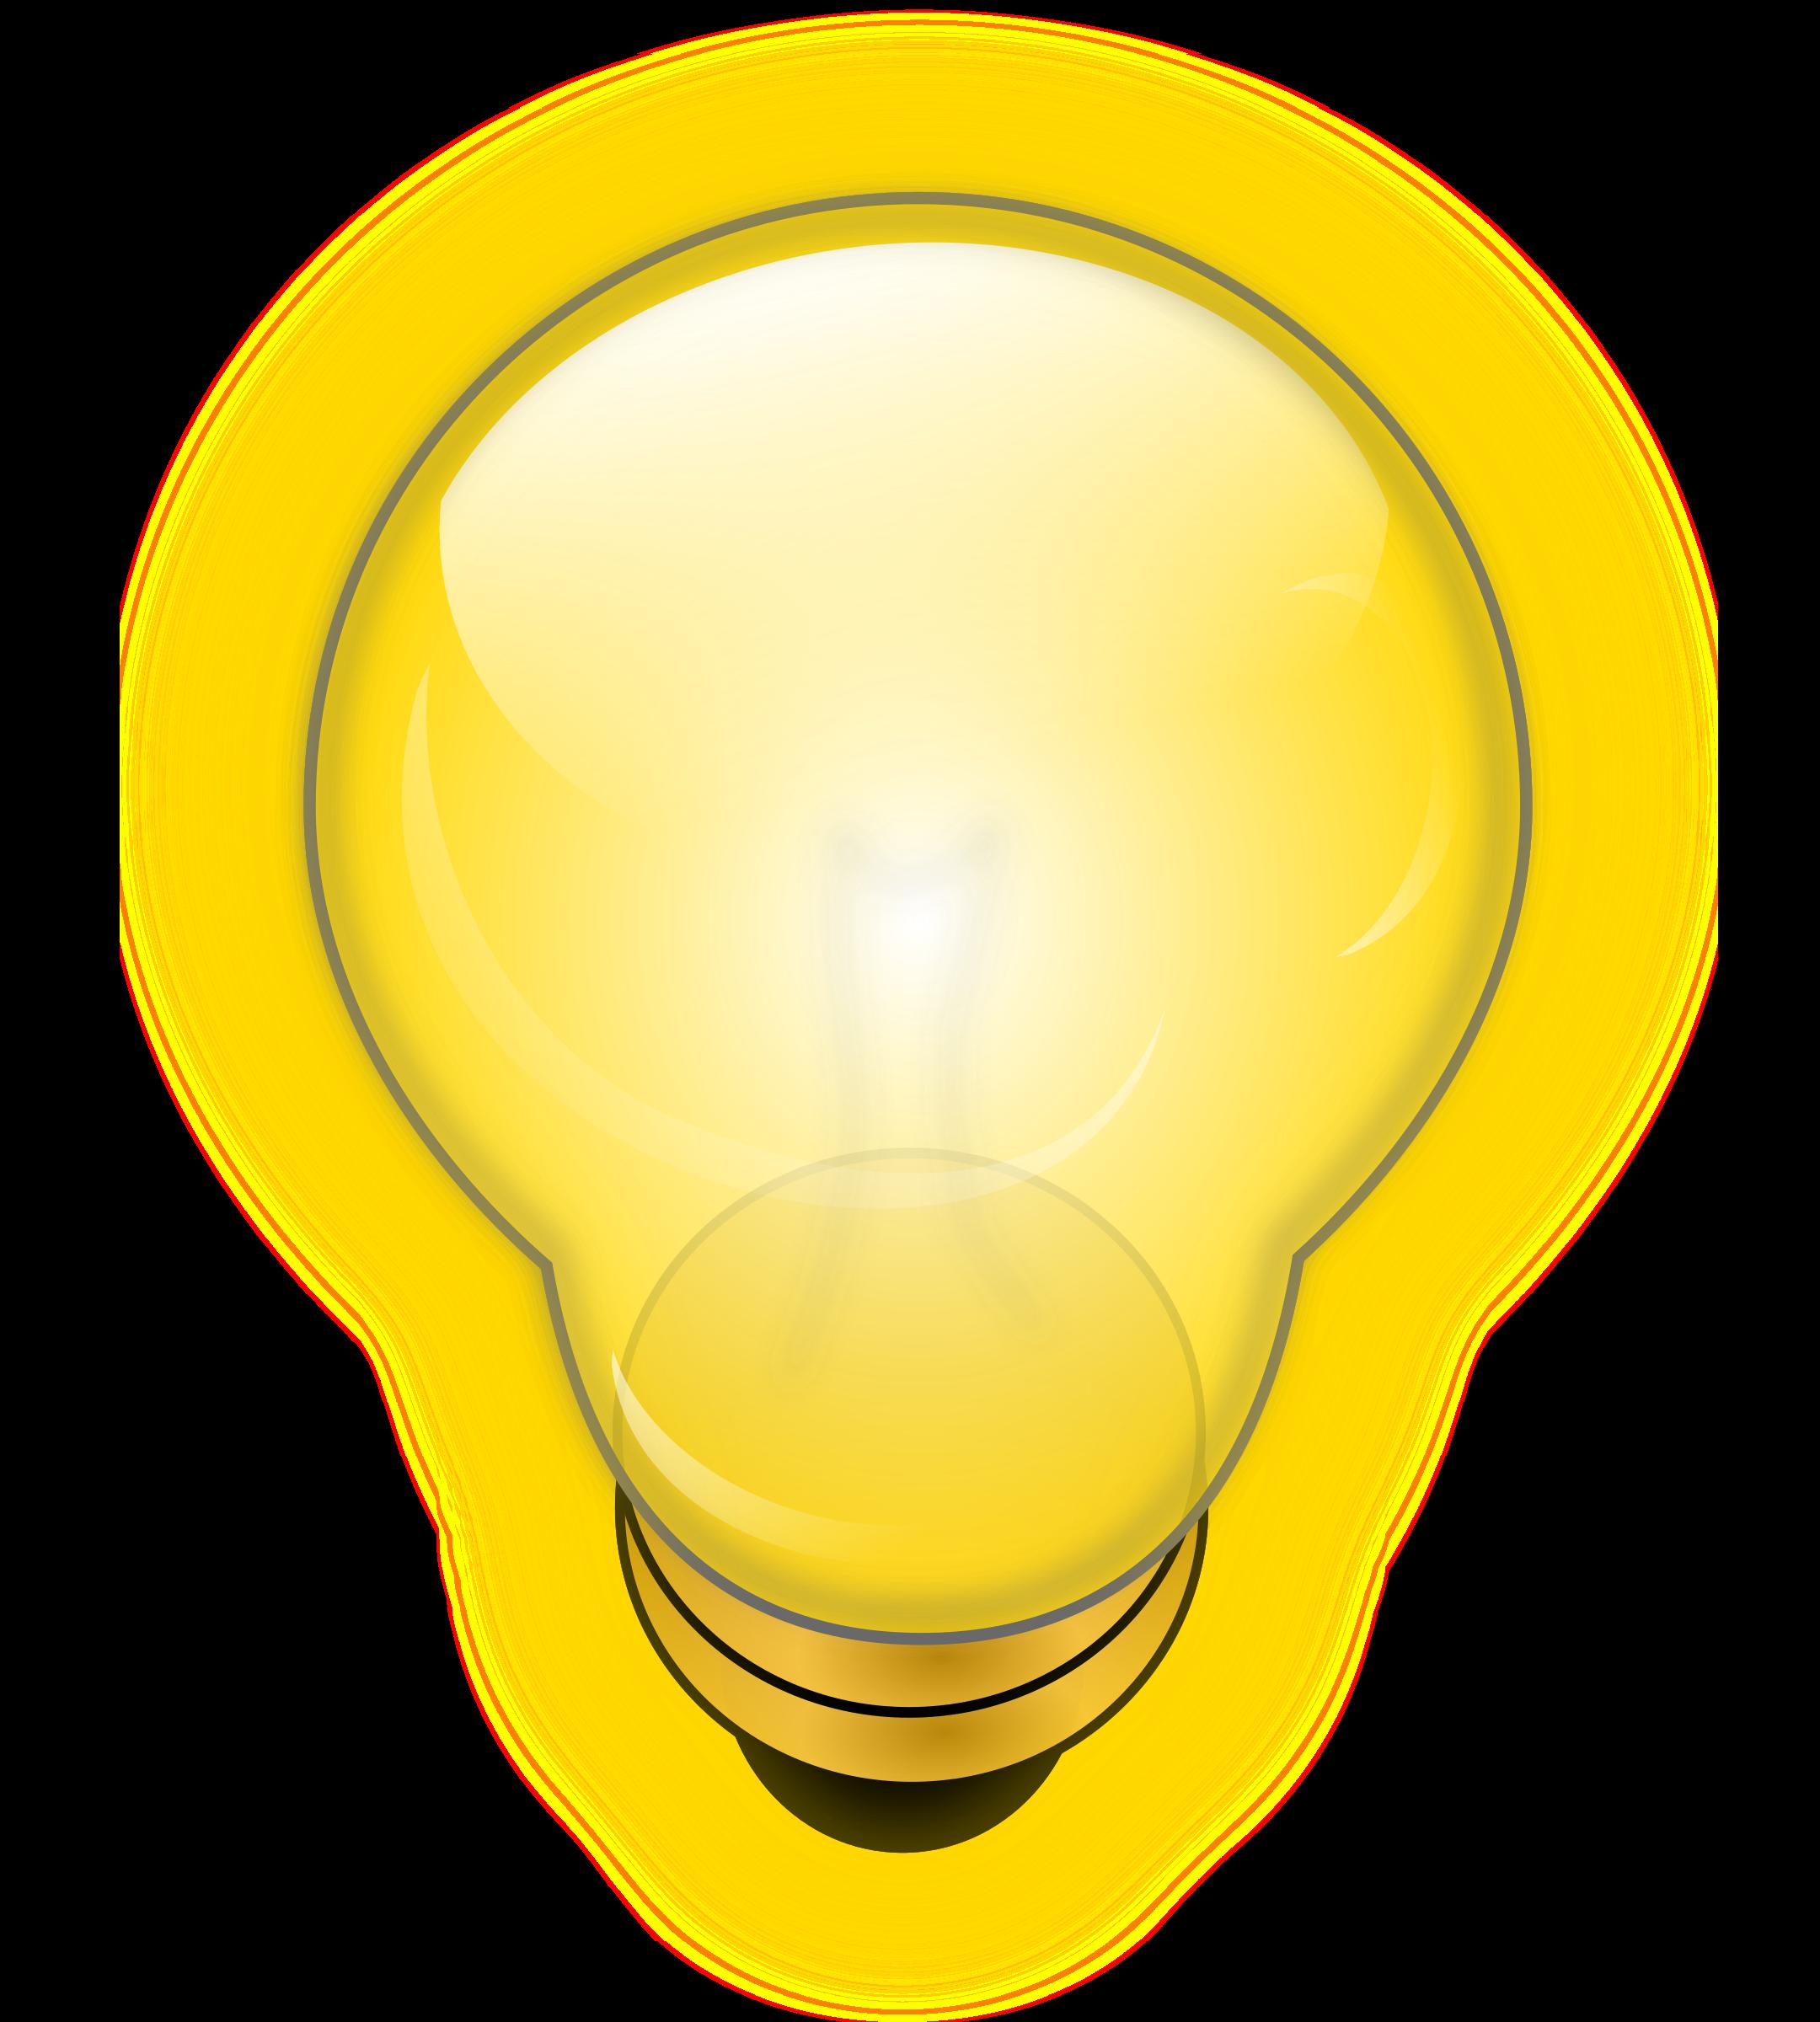 Lamp clipart light globe. Glowing bulb big image